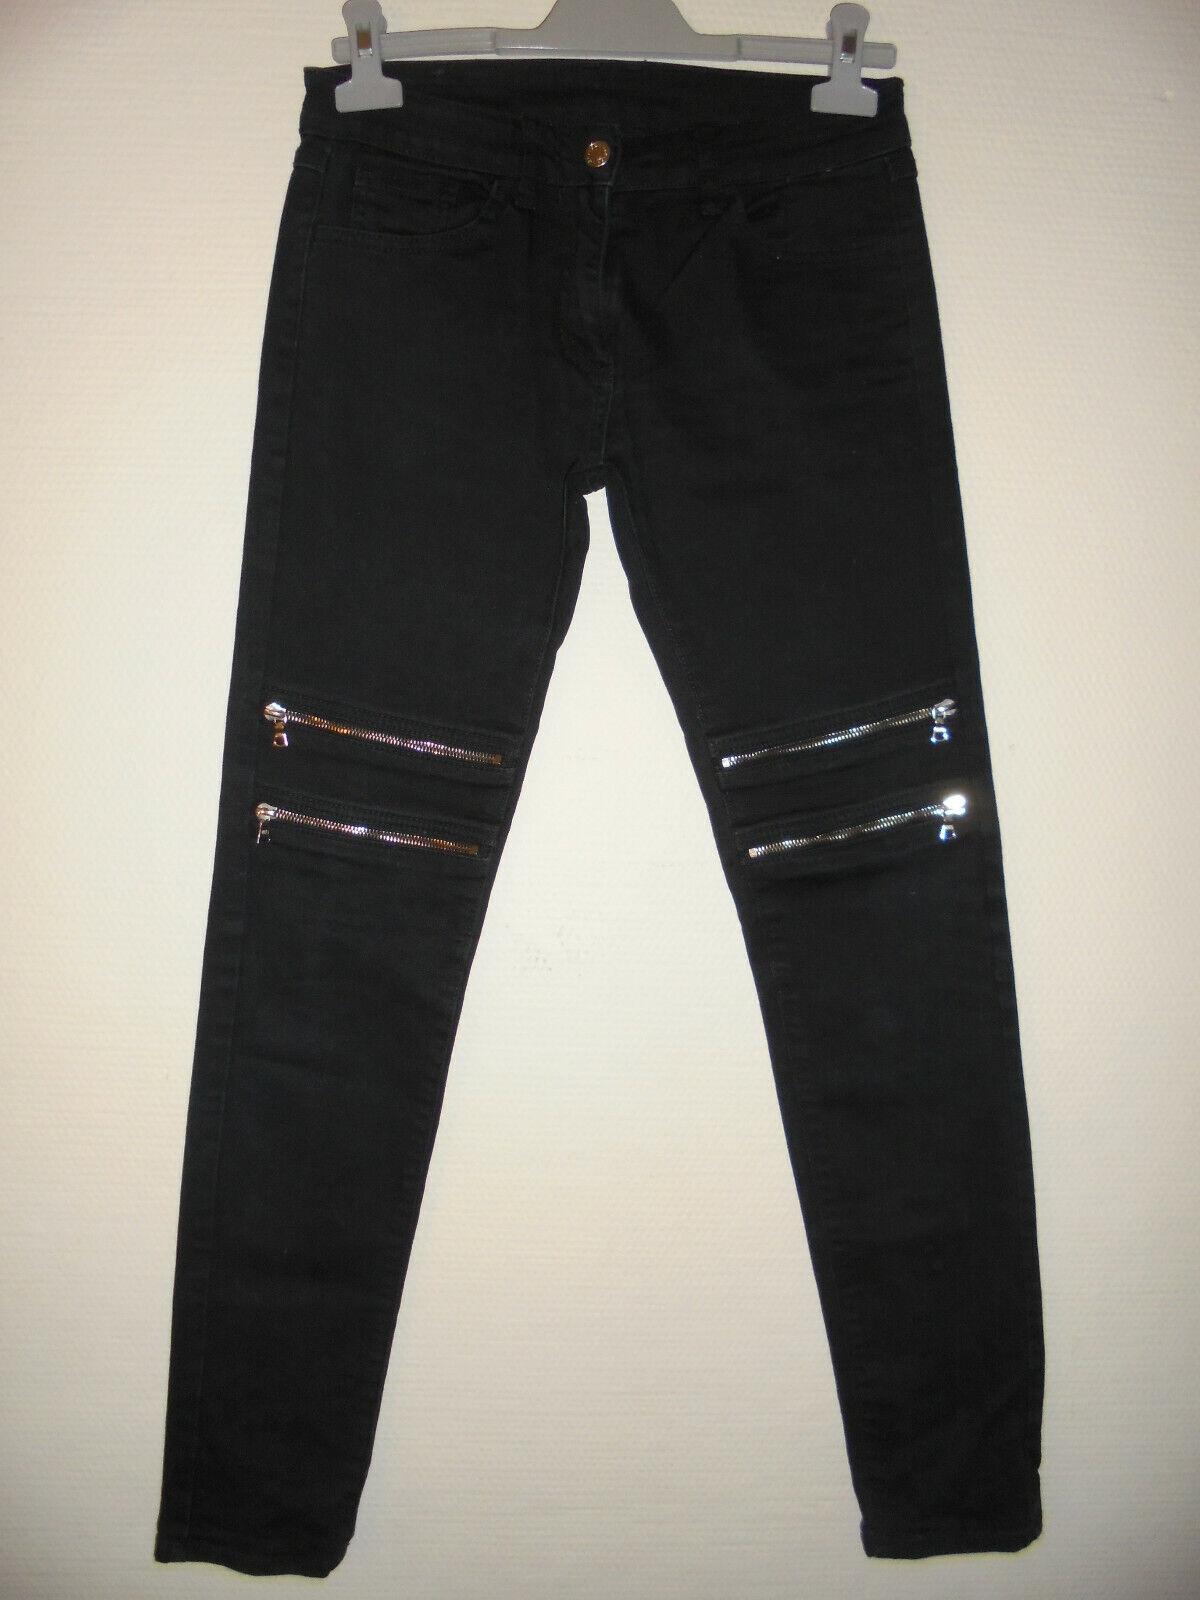 Sandro jean slim skinny jambes zippées t36